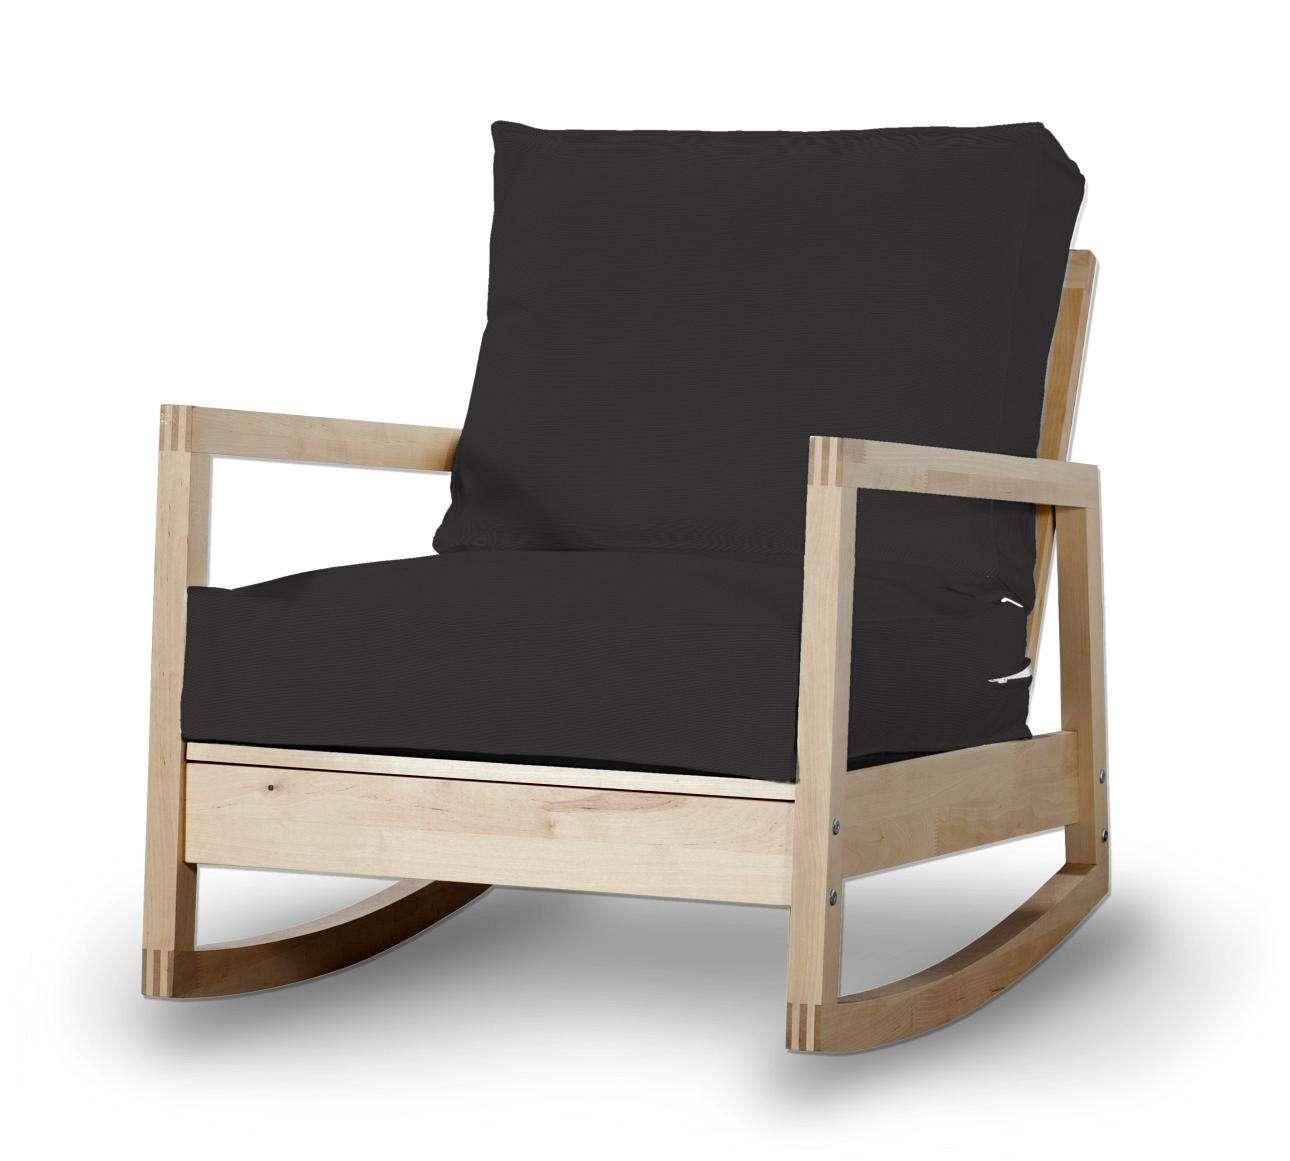 Pokrowiec na fotel Lillberg Fotel Lillberg w kolekcji Cotton Panama, tkanina: 702-08